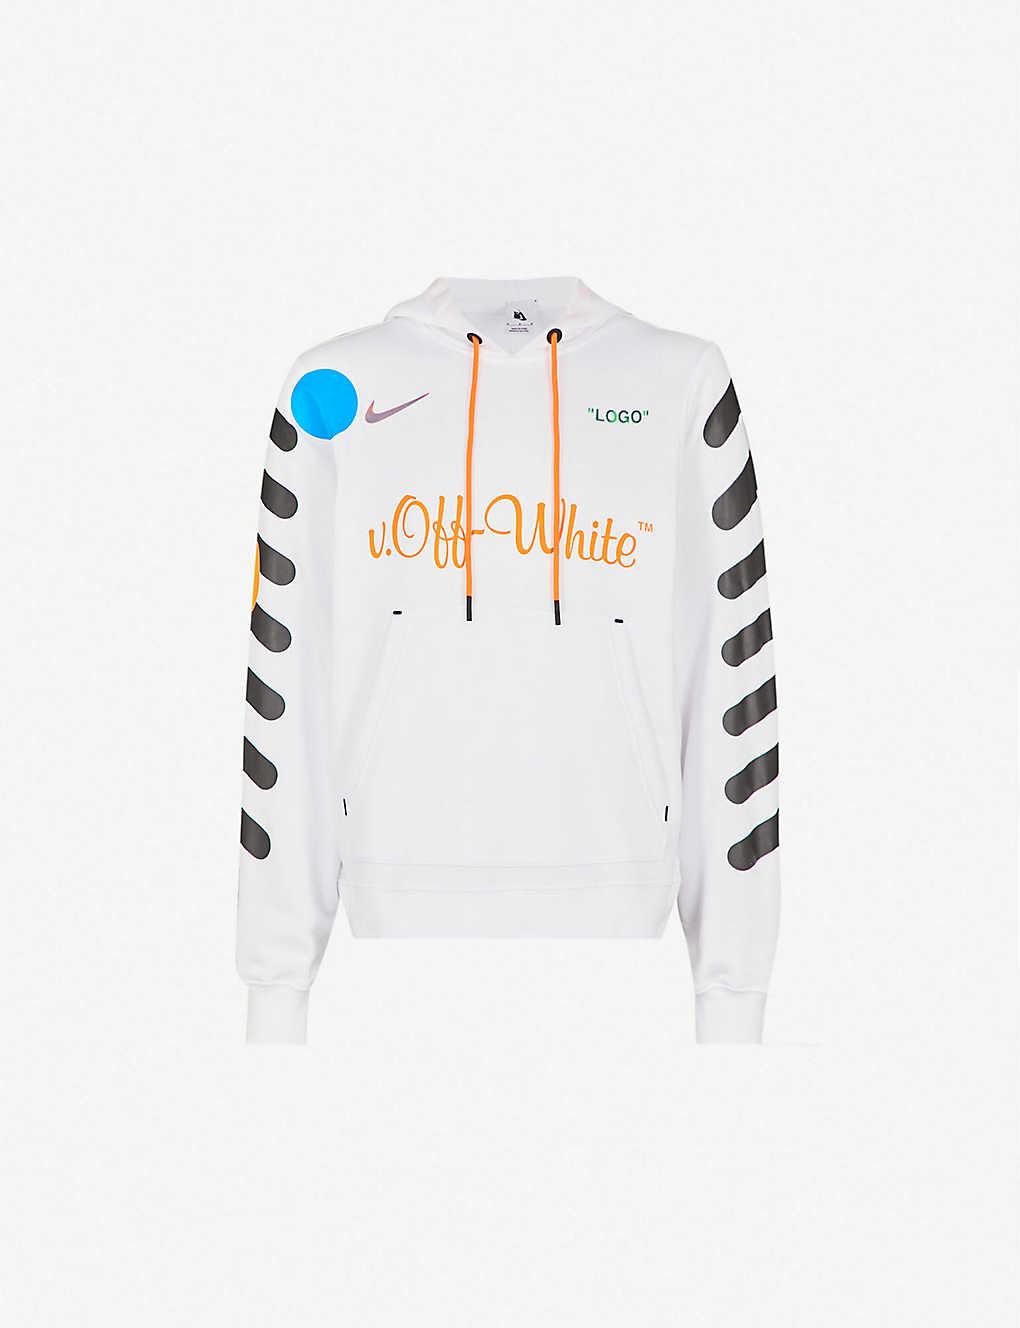 NIKE X OFF-WHITE - Logo-print cotton-jersey hoody  98c3c1155